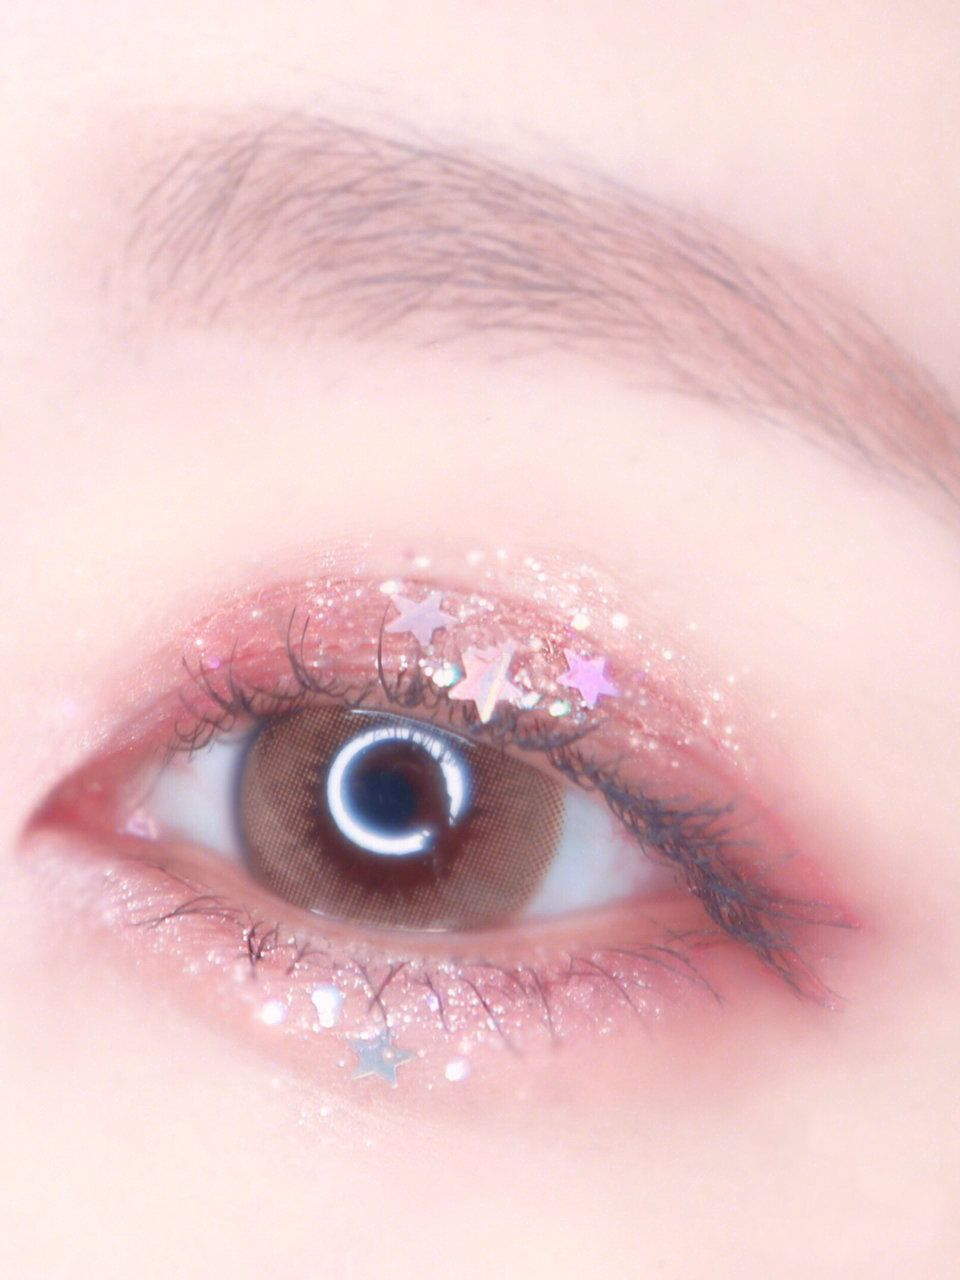 Stardust Glitter Makeup Kamakula Glitter Makeup Looks Korean Eye Makeup Asian Eye Makeup